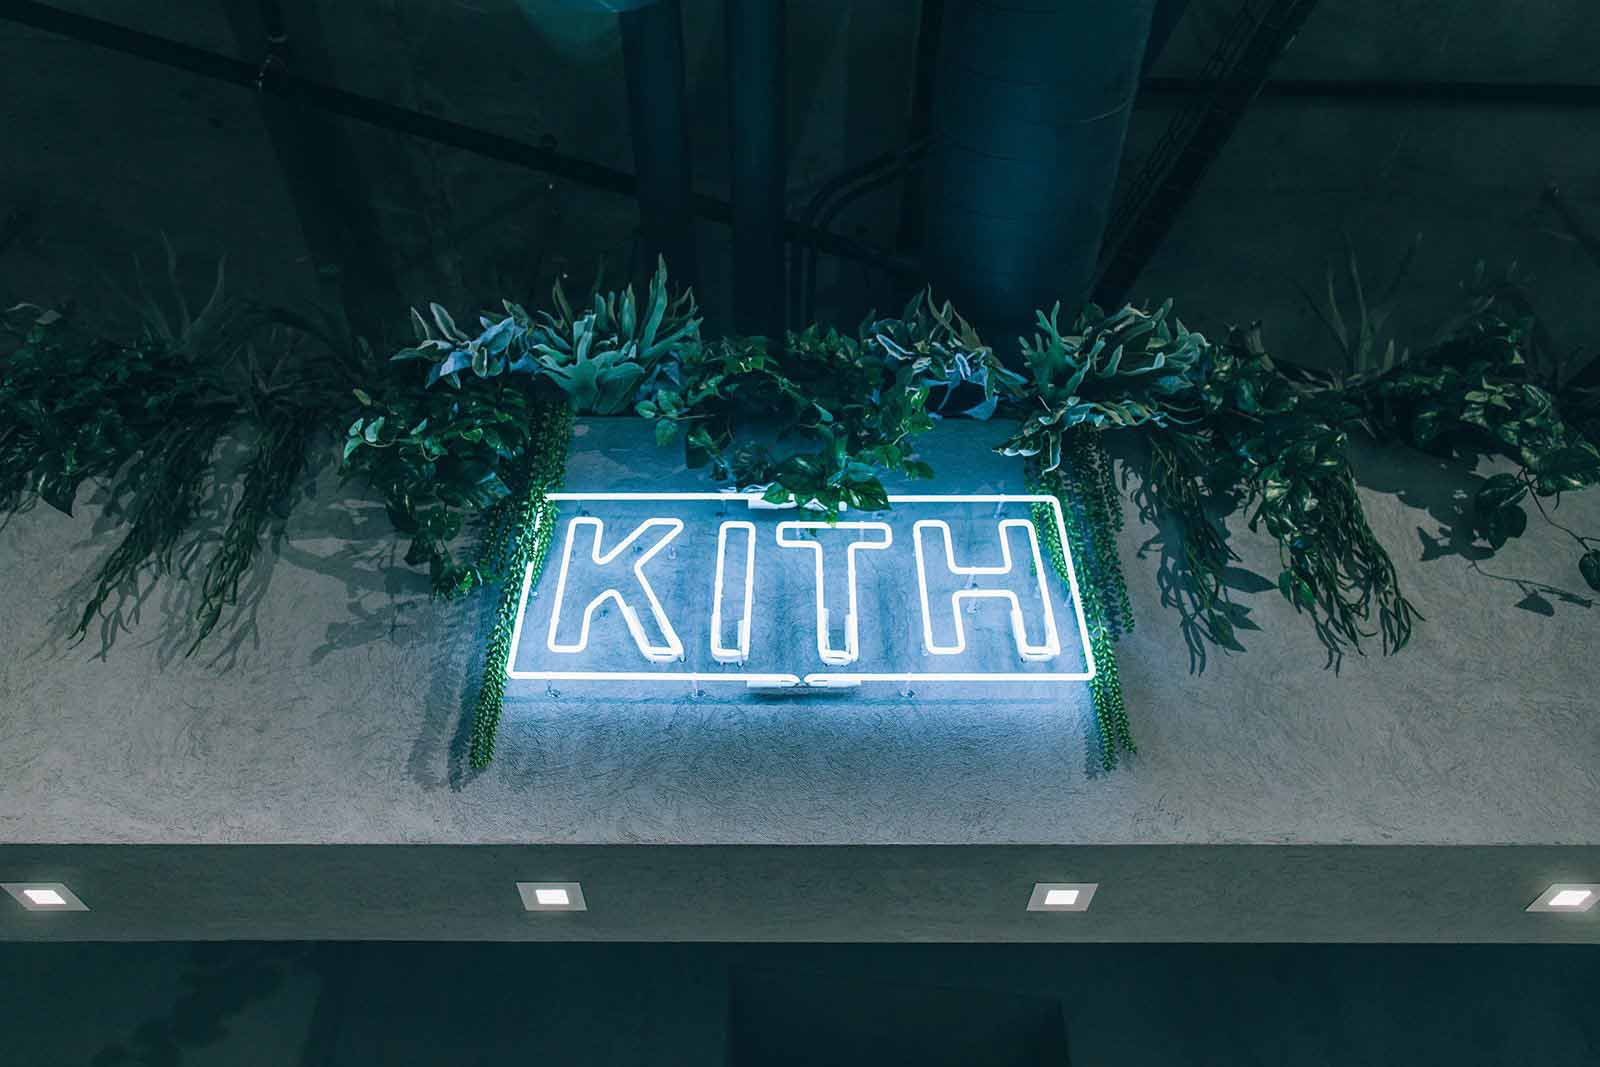 kith-los-angeles-9